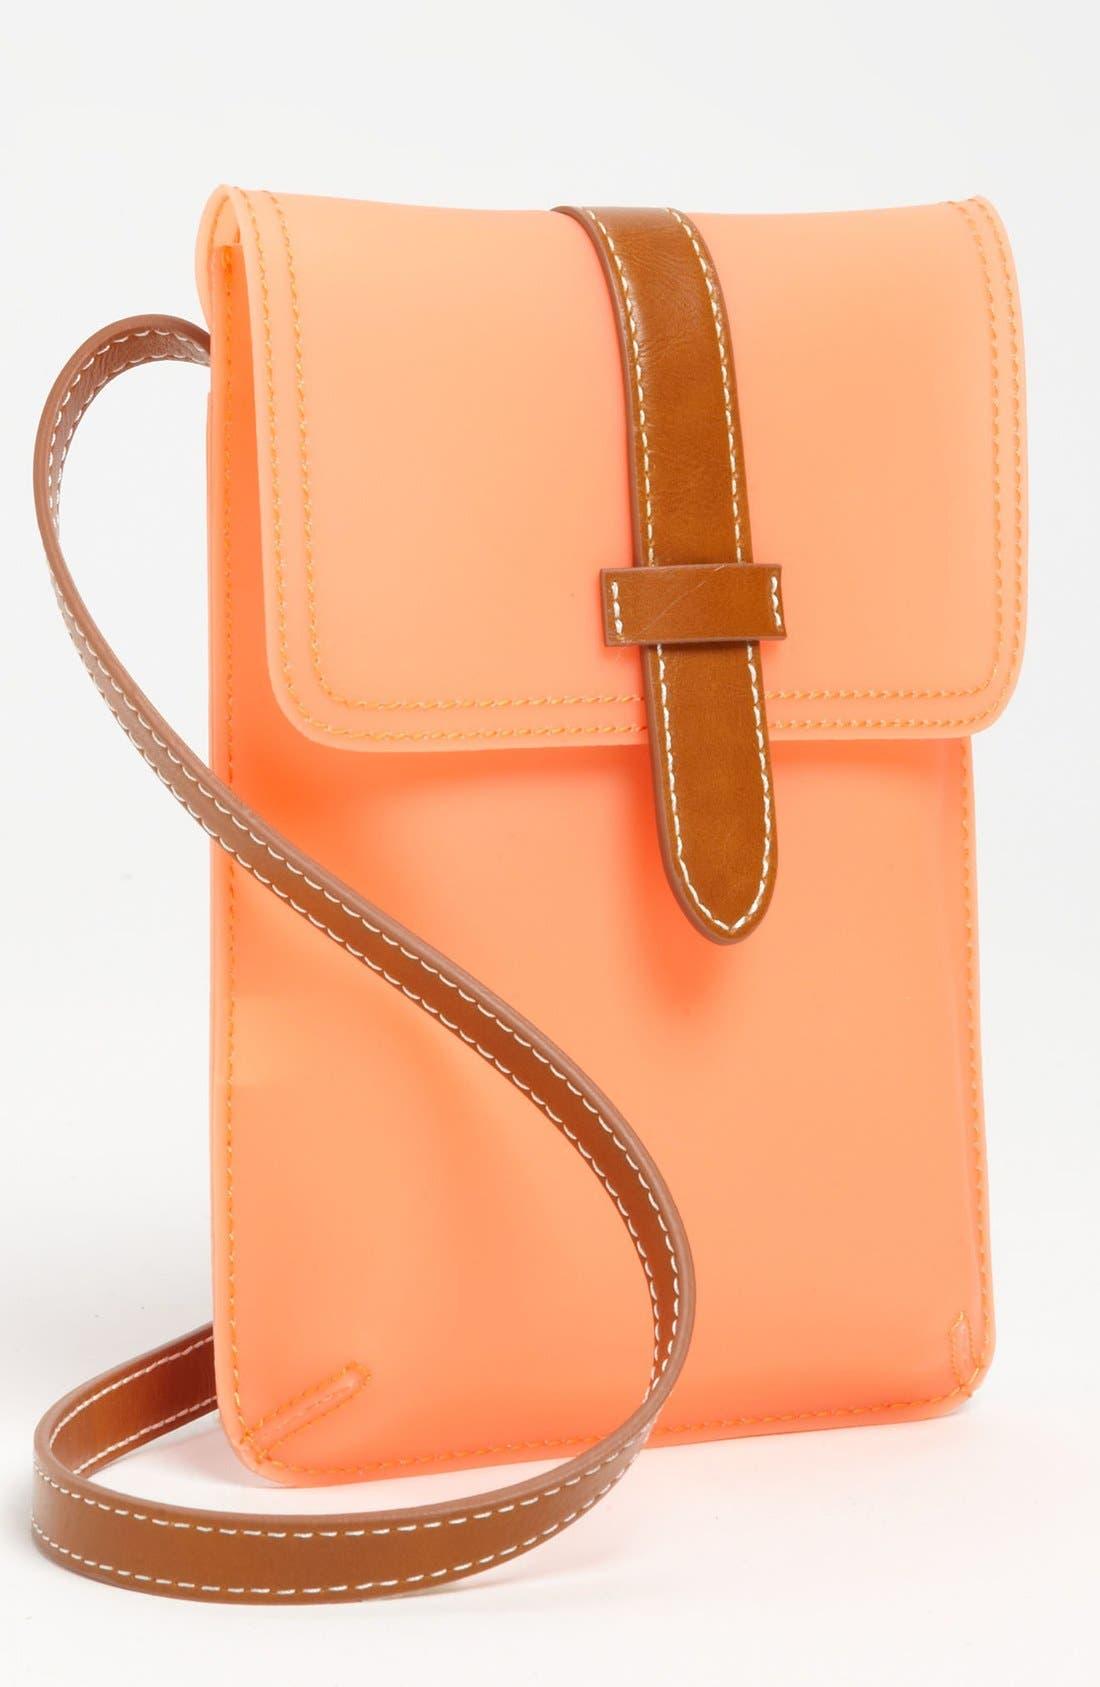 Alternate Image 1 Selected - Tarnish Jelly Crossbody Bag